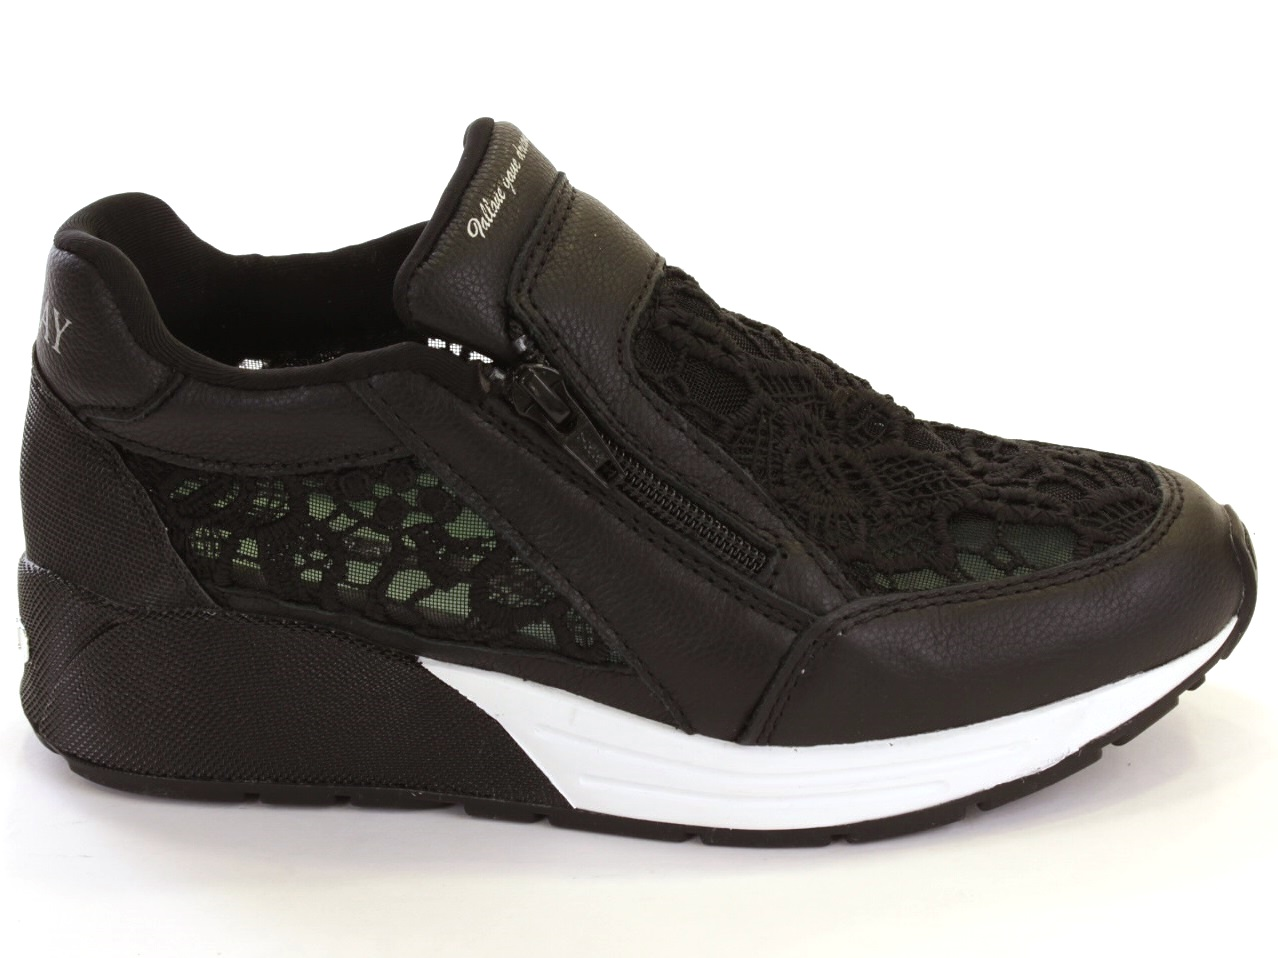 Sneakers and Espadrilles Replay - 621 WALDEM